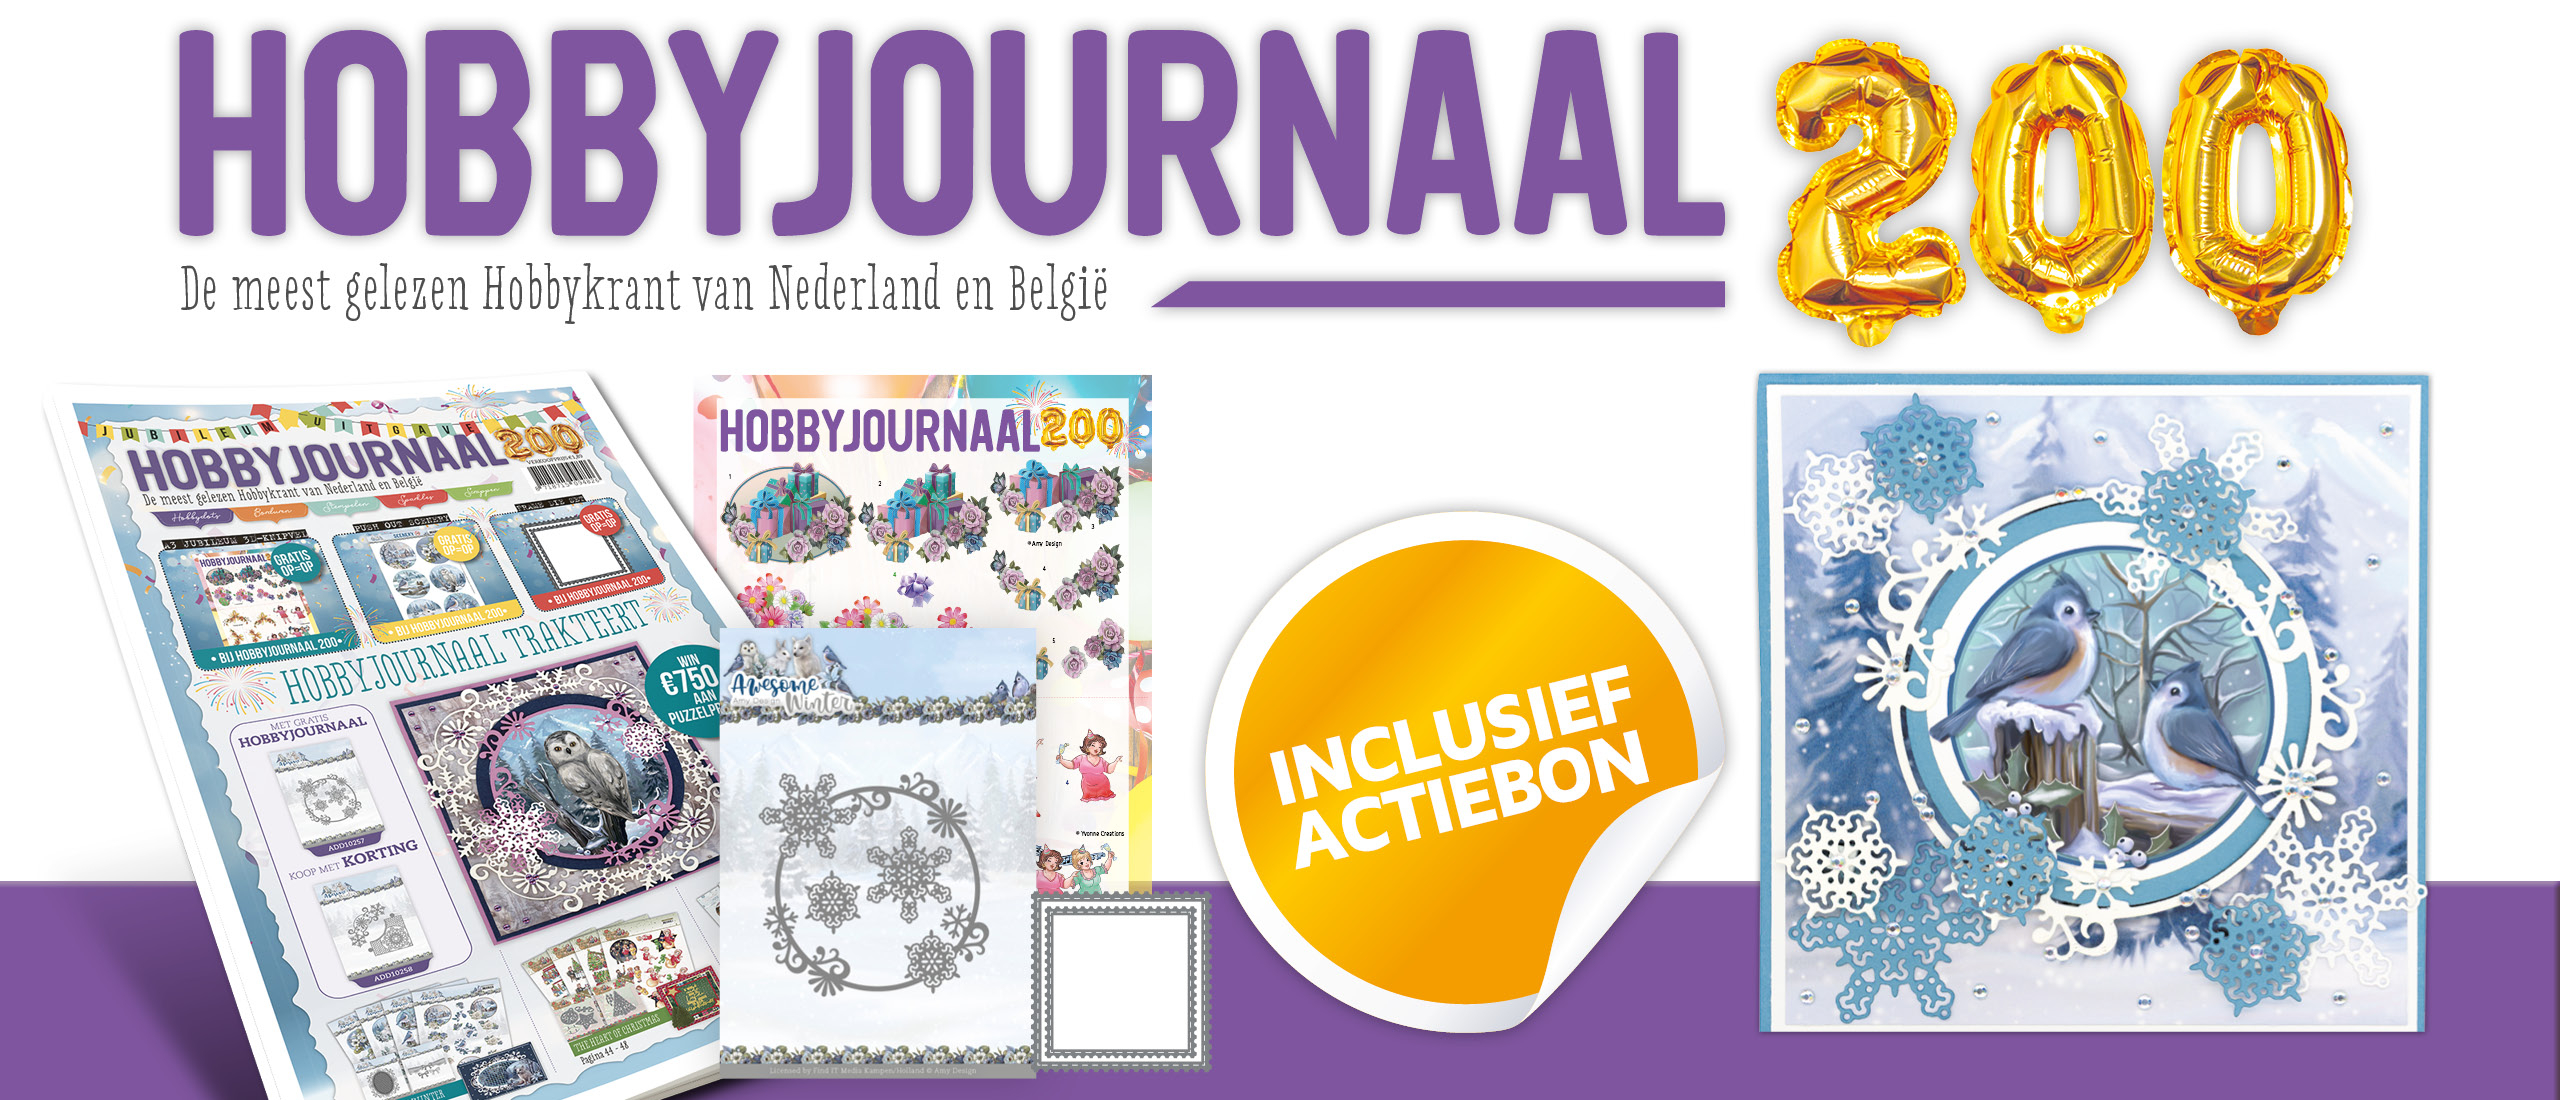 Hobbyjournaal 200 komt eraan!